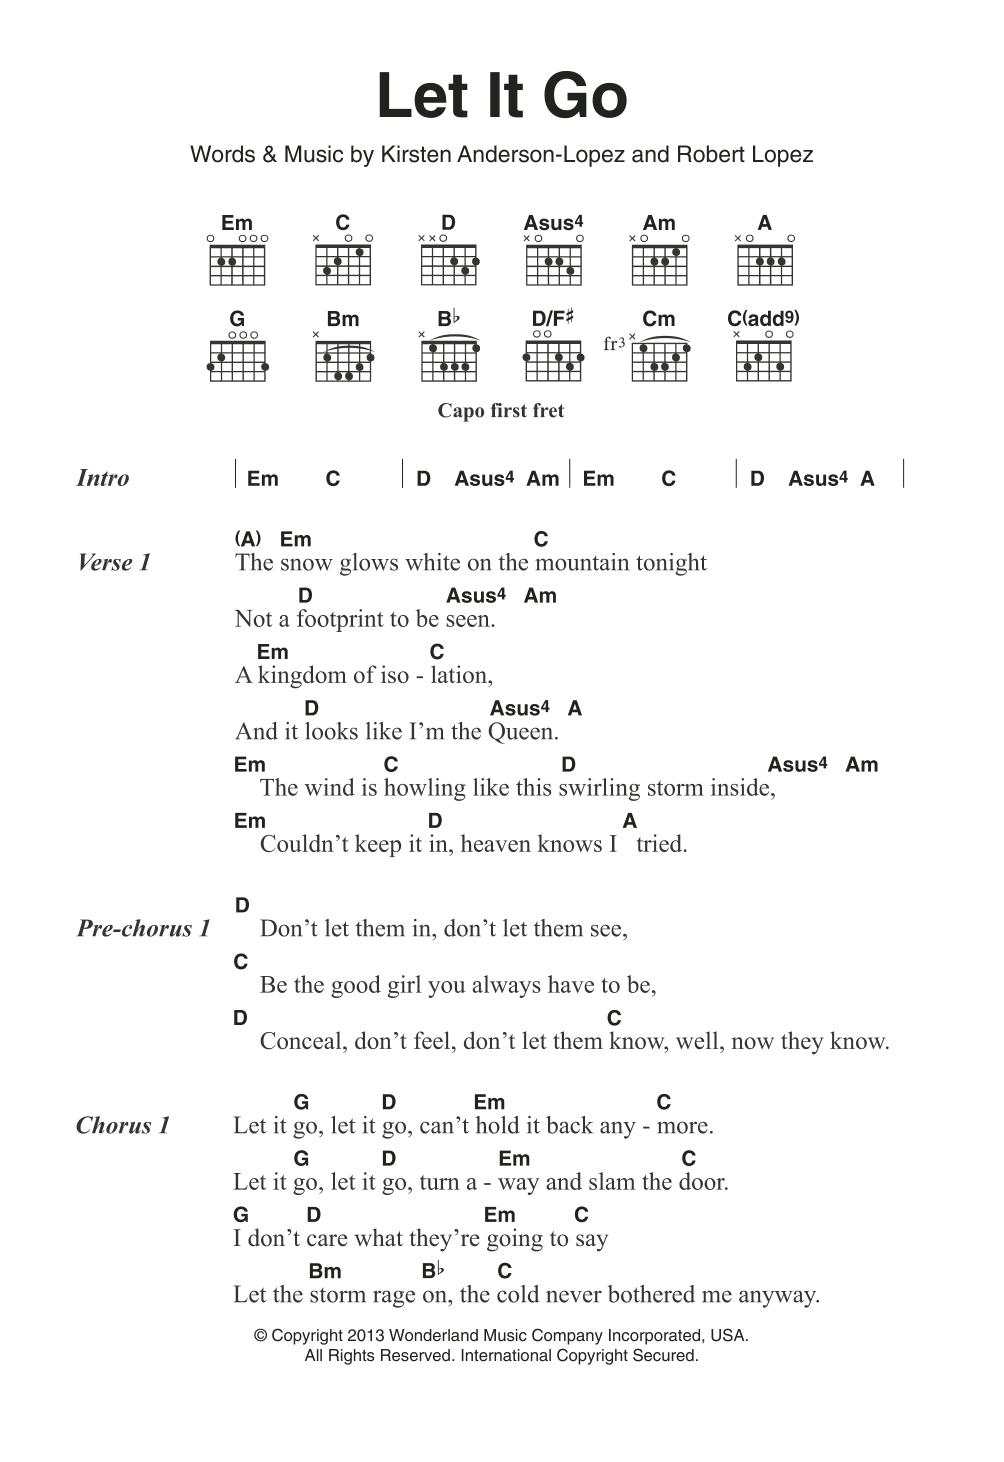 Let It Go From Frozen Sheet Music Idina Menzel Guitar Chords Lyrics Guitar Chords And Lyrics Guitar Chords For Songs Easy Guitar Songs Chords